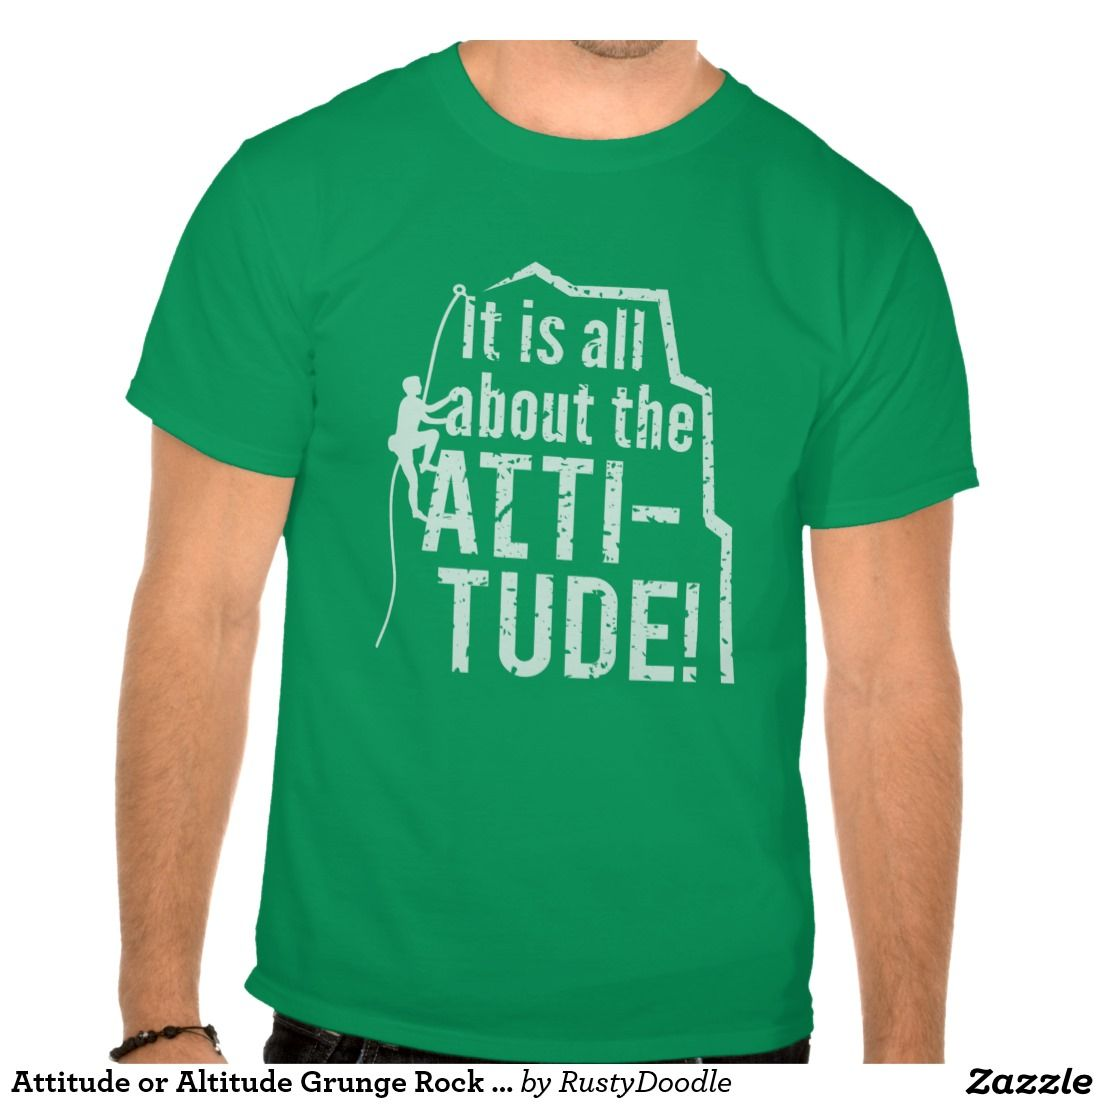 Attitude or Altitude Grunge Rock Climbing T-Shirt